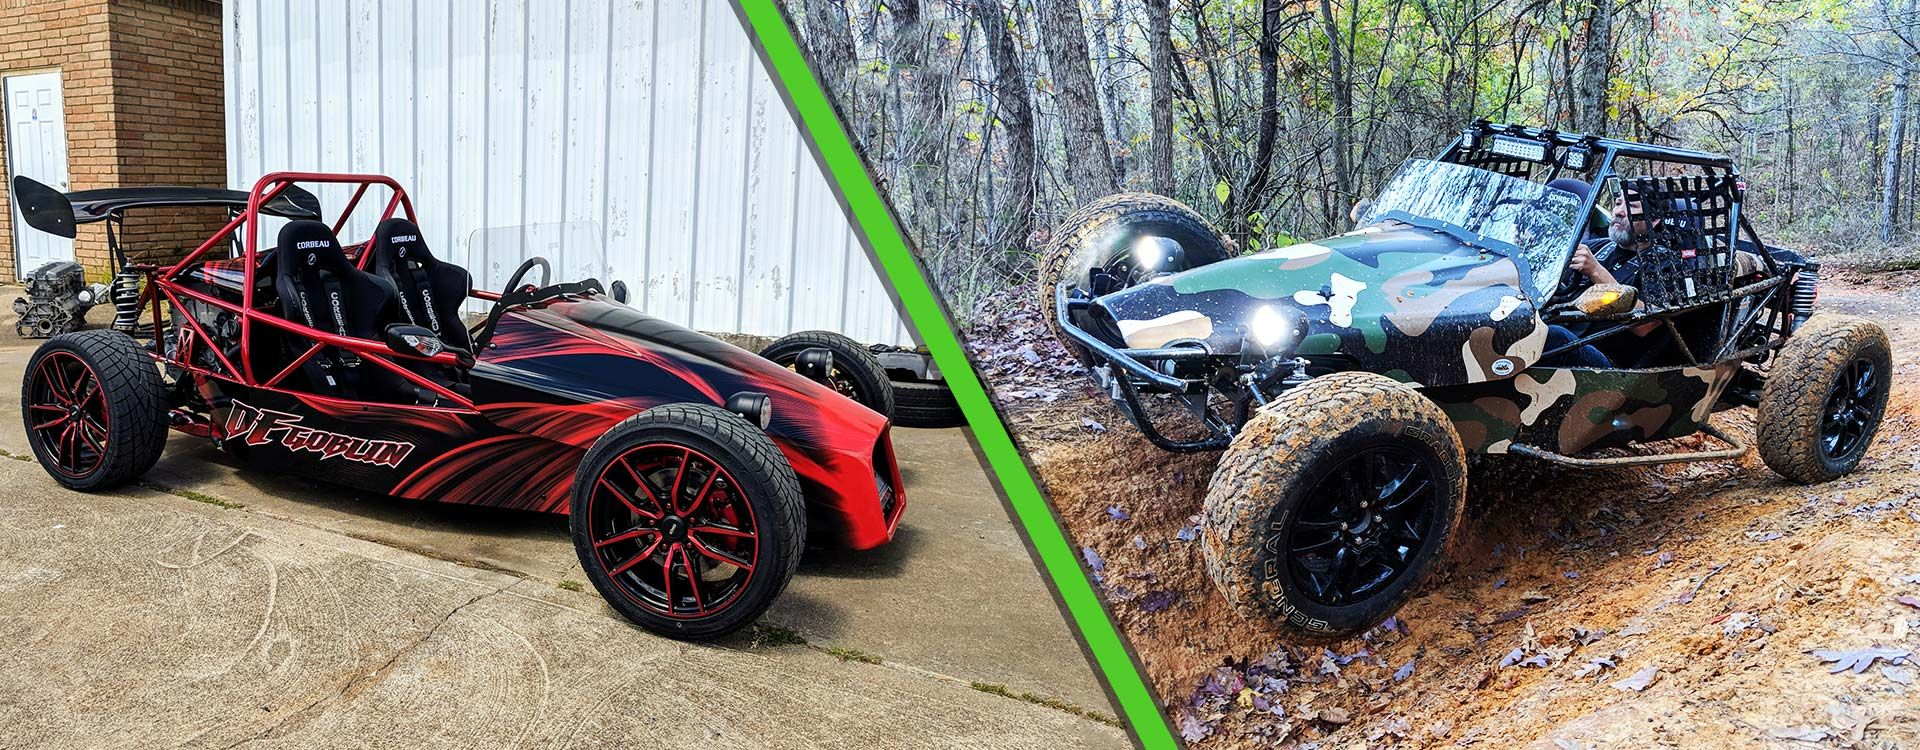 Df Kit Car >> Df Kit Car Modern Mid Engine Kit Cars American Made Stuff